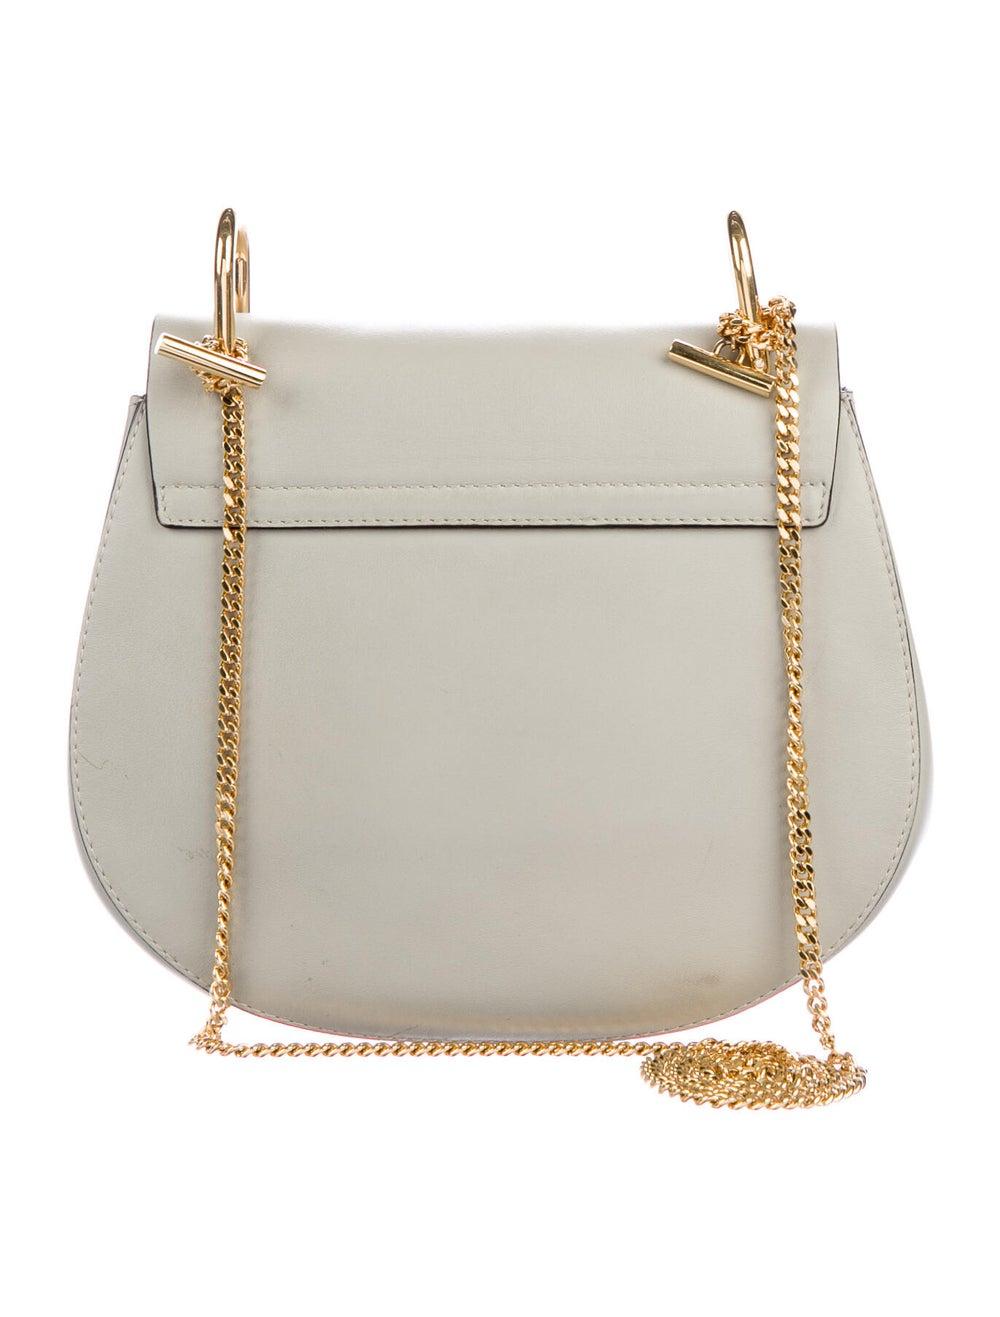 Chloé Leather Drew Crossbody Bag Black - image 4